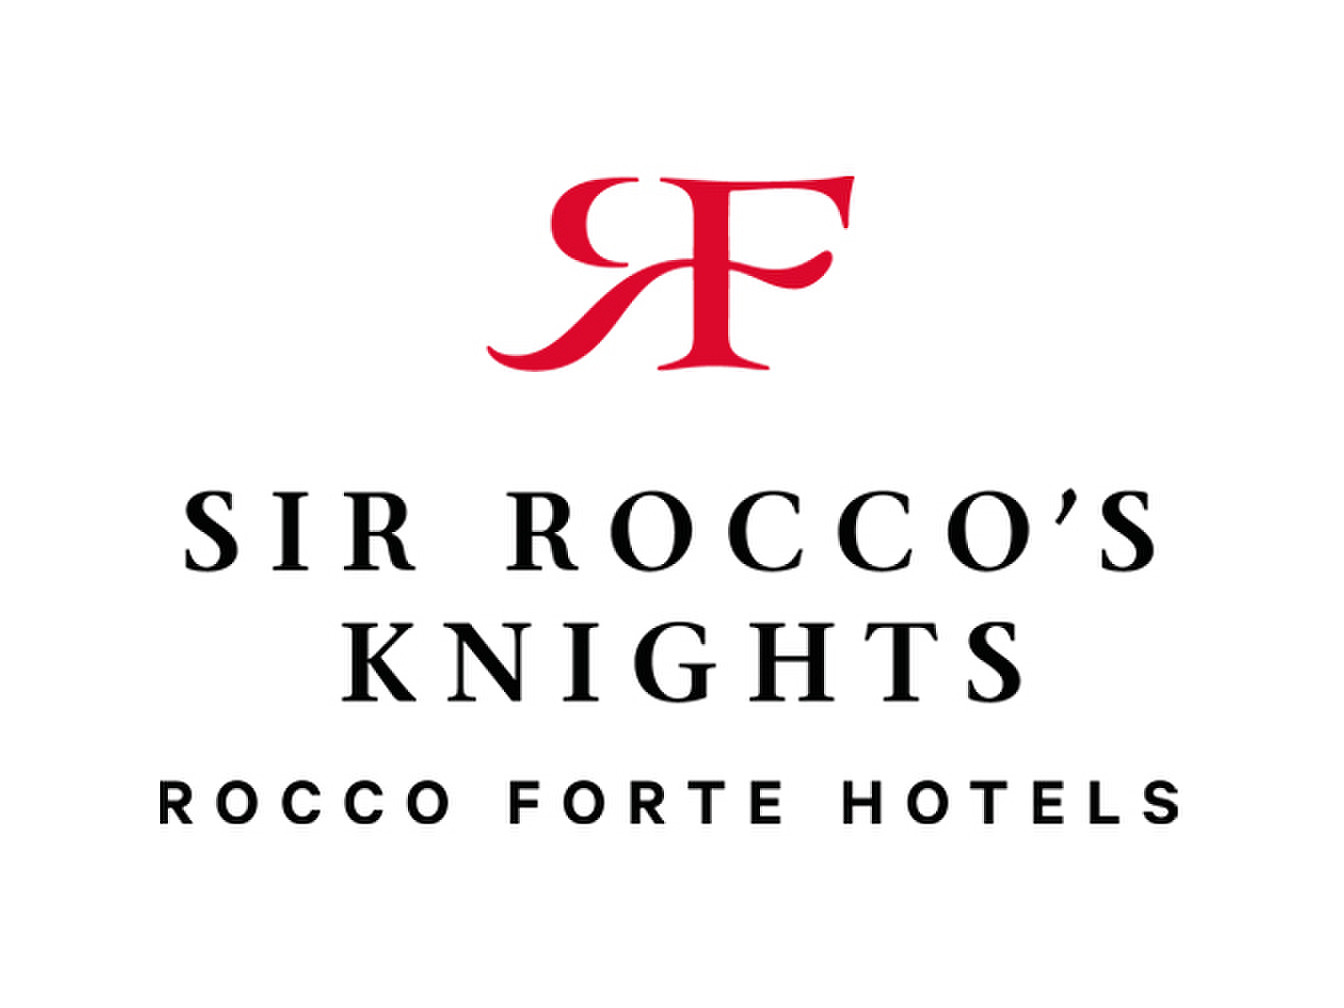 roccos-knights.jpg